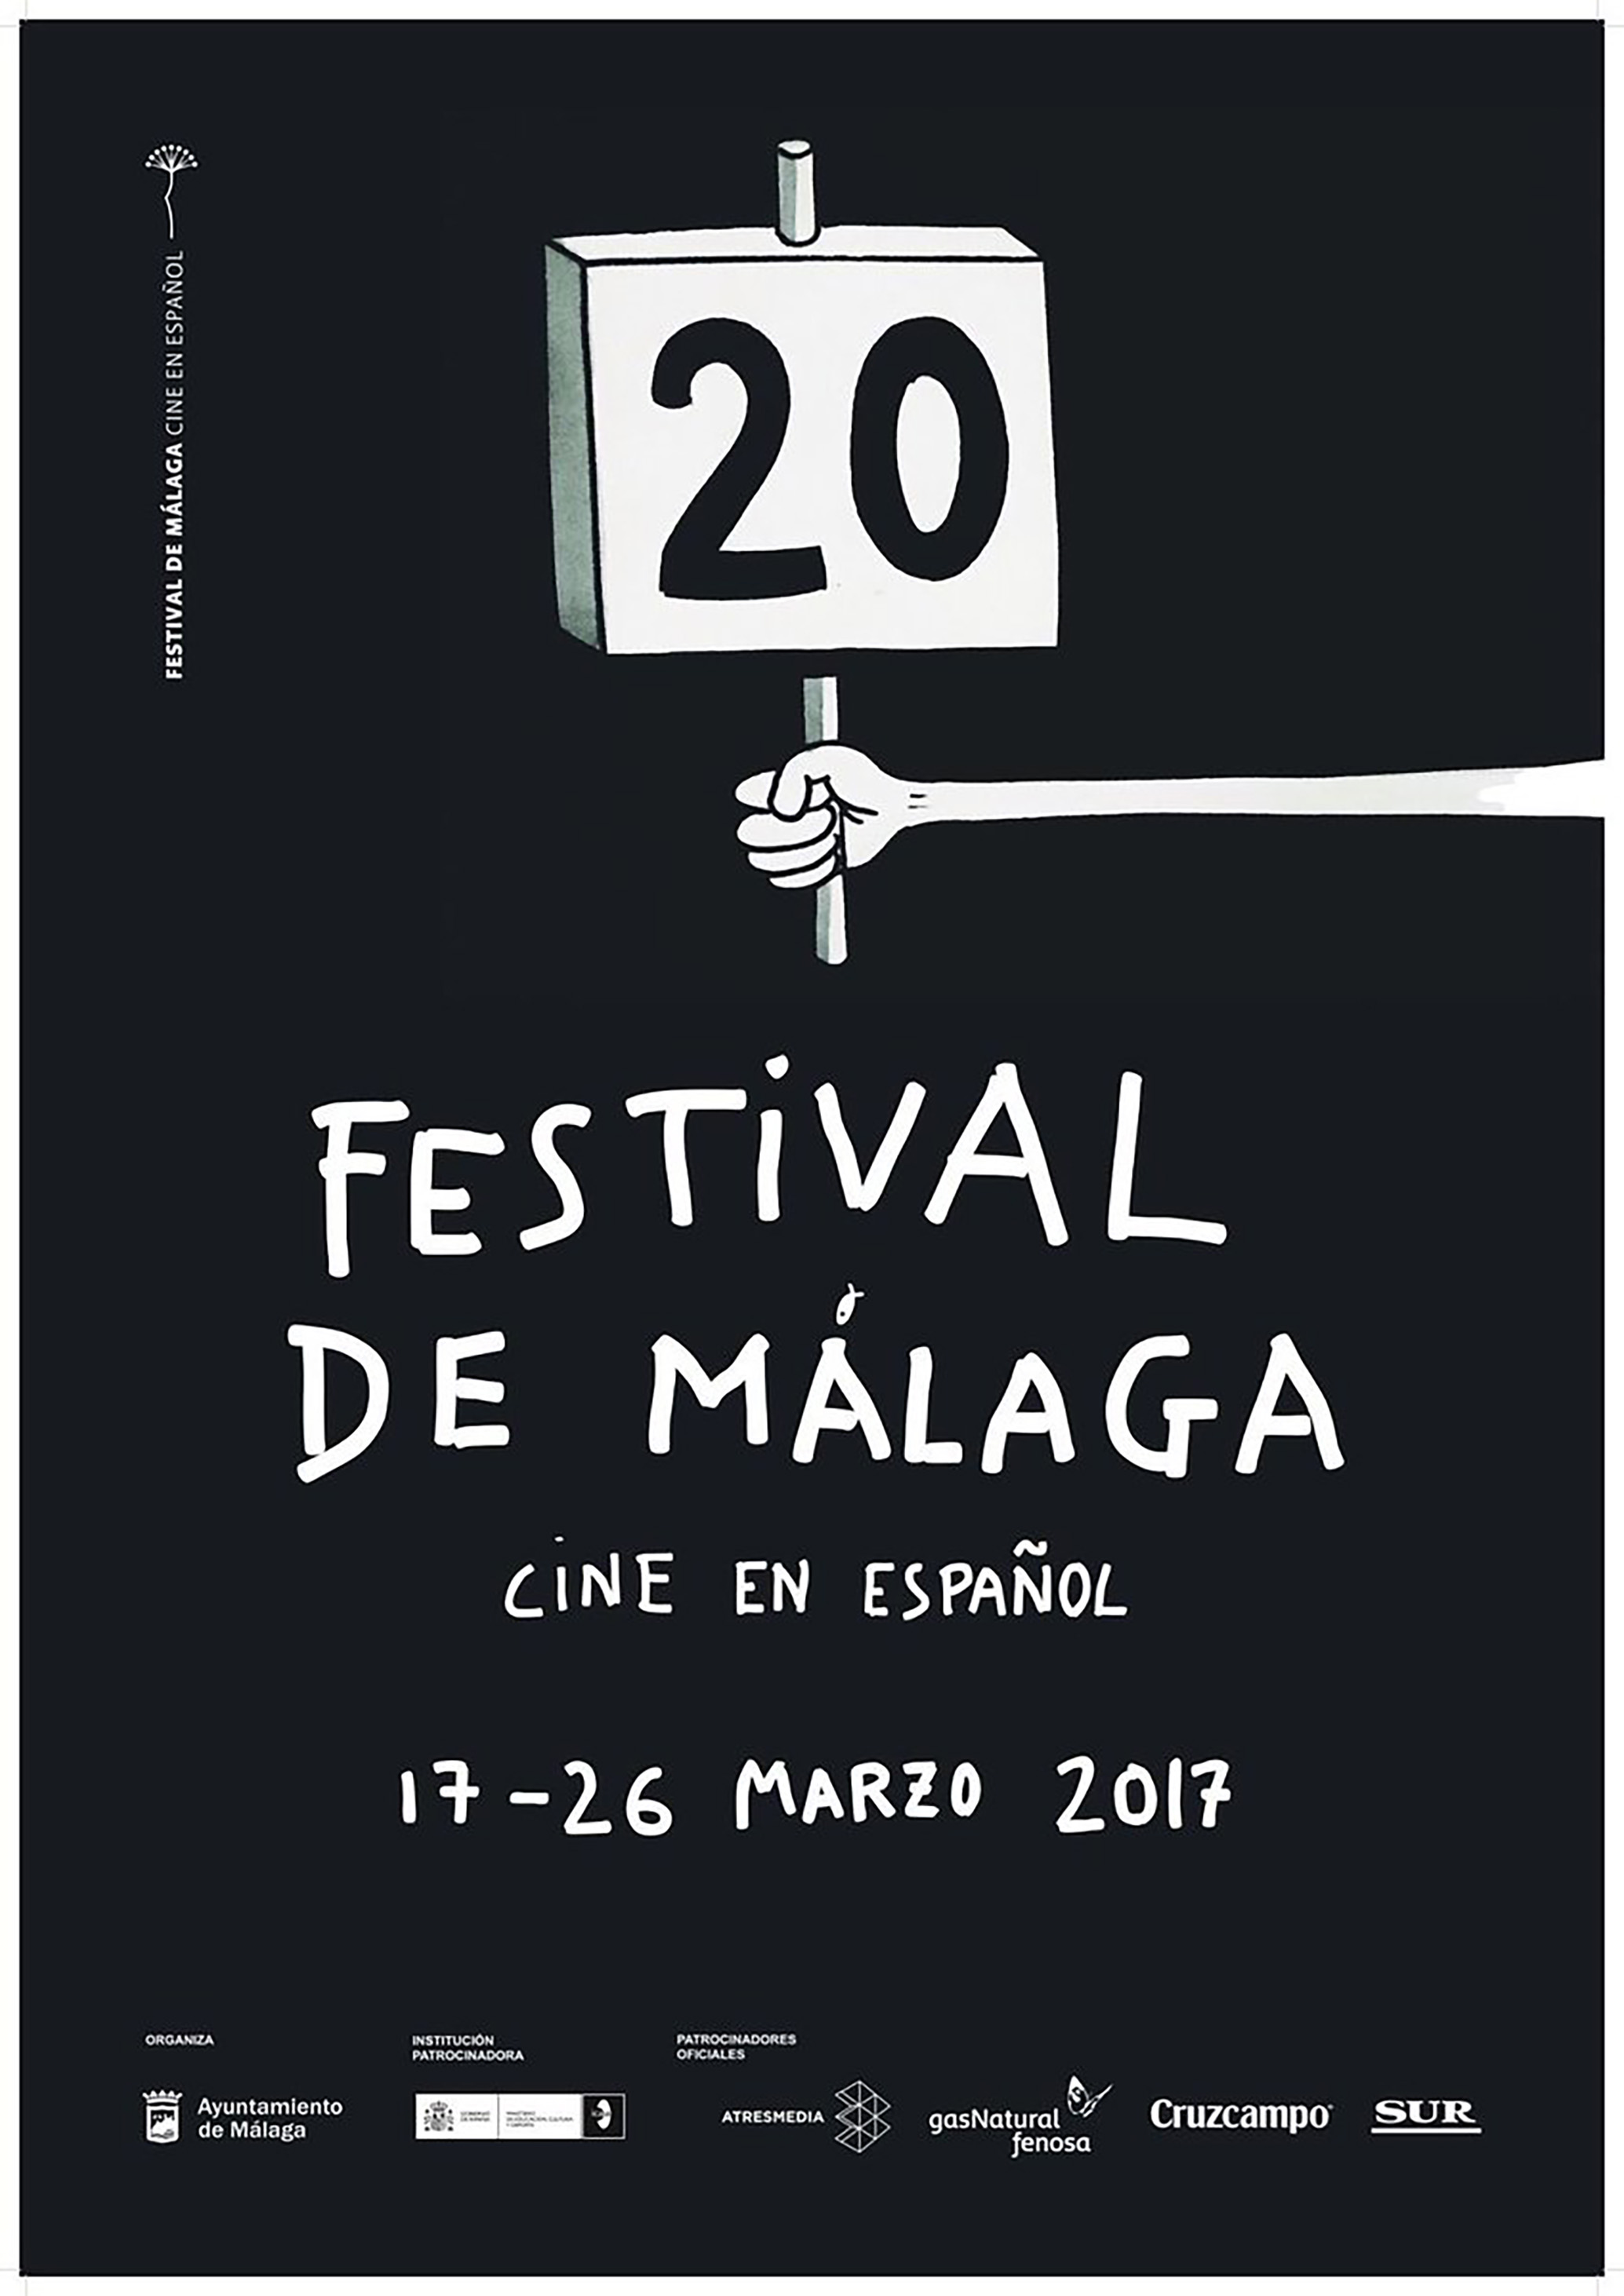 cvc_17_festivalMalaga-interior2